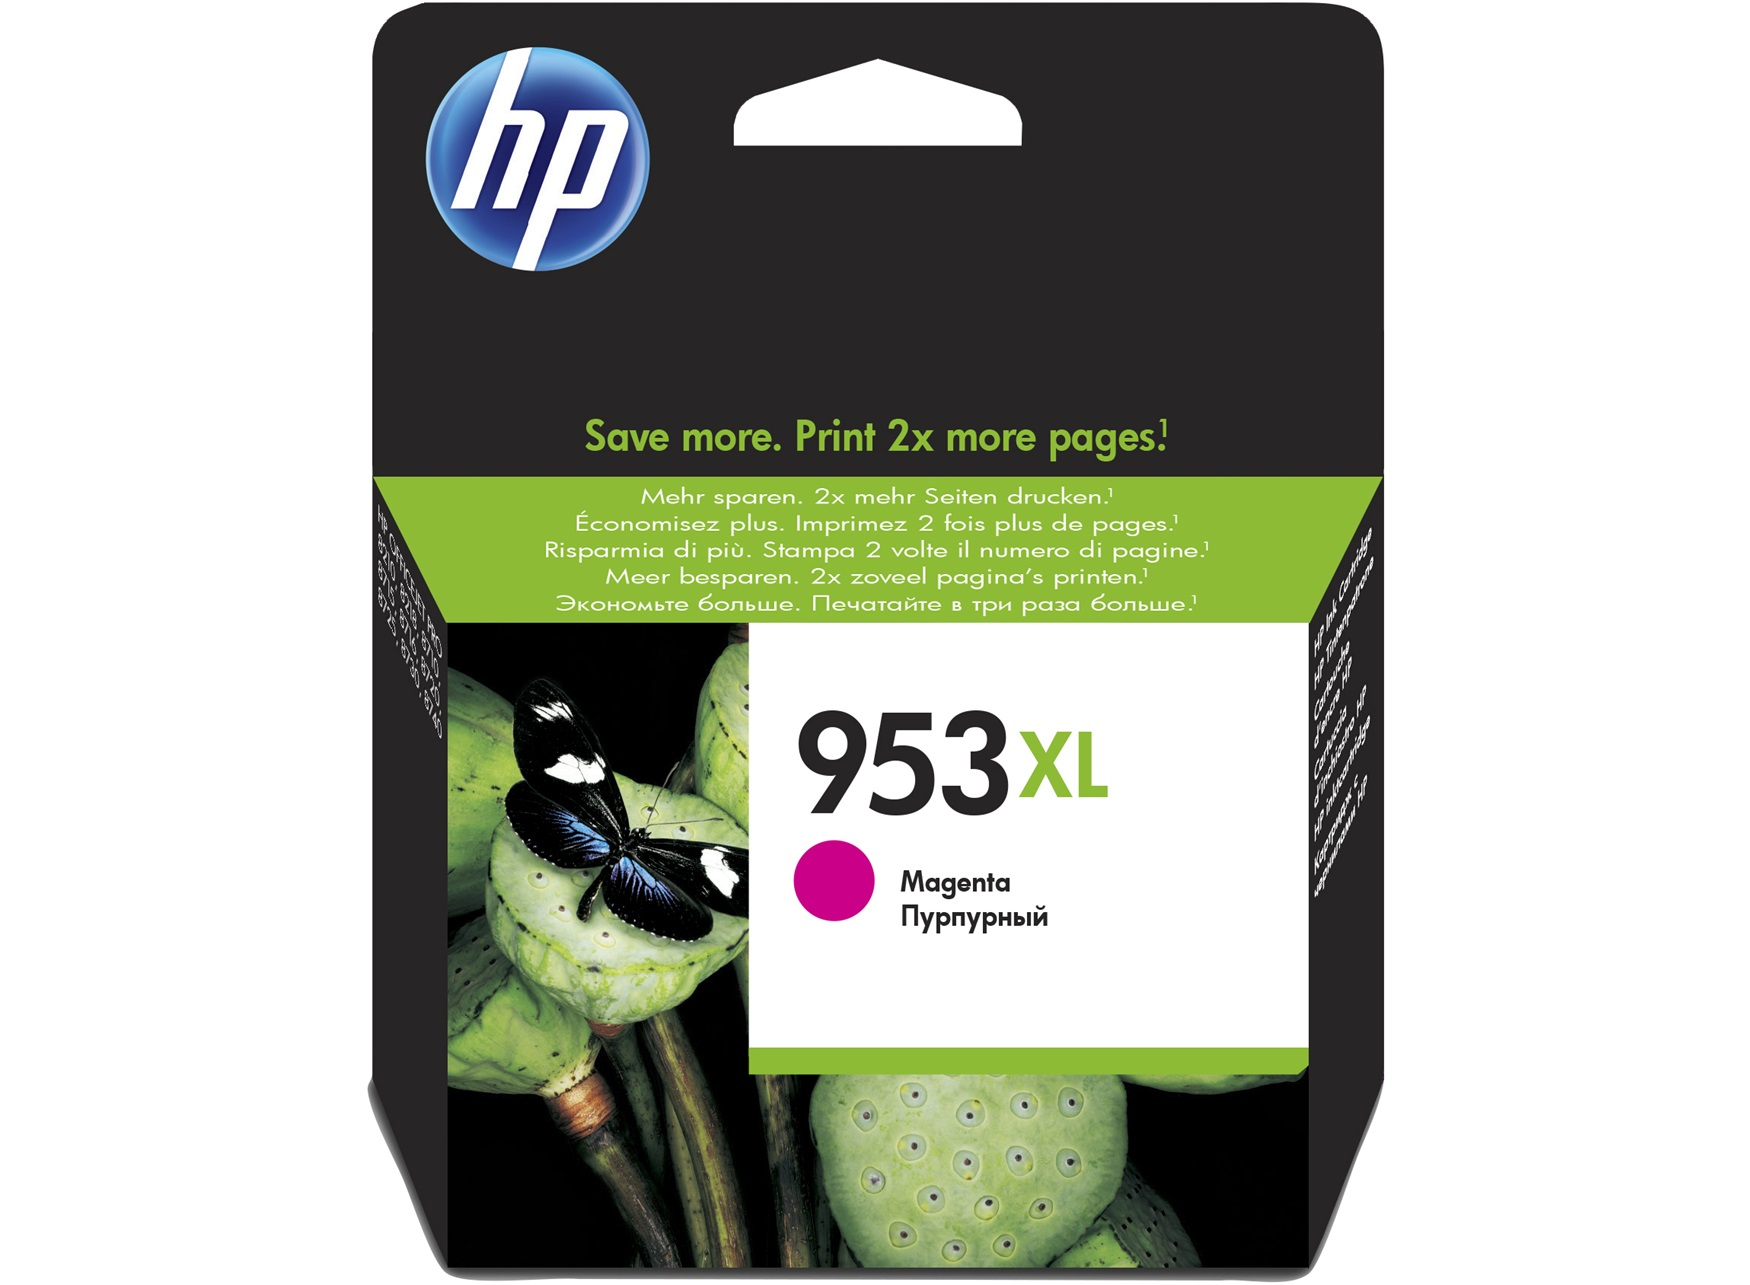 HP 953XL Magenta Original Ink Cartridge